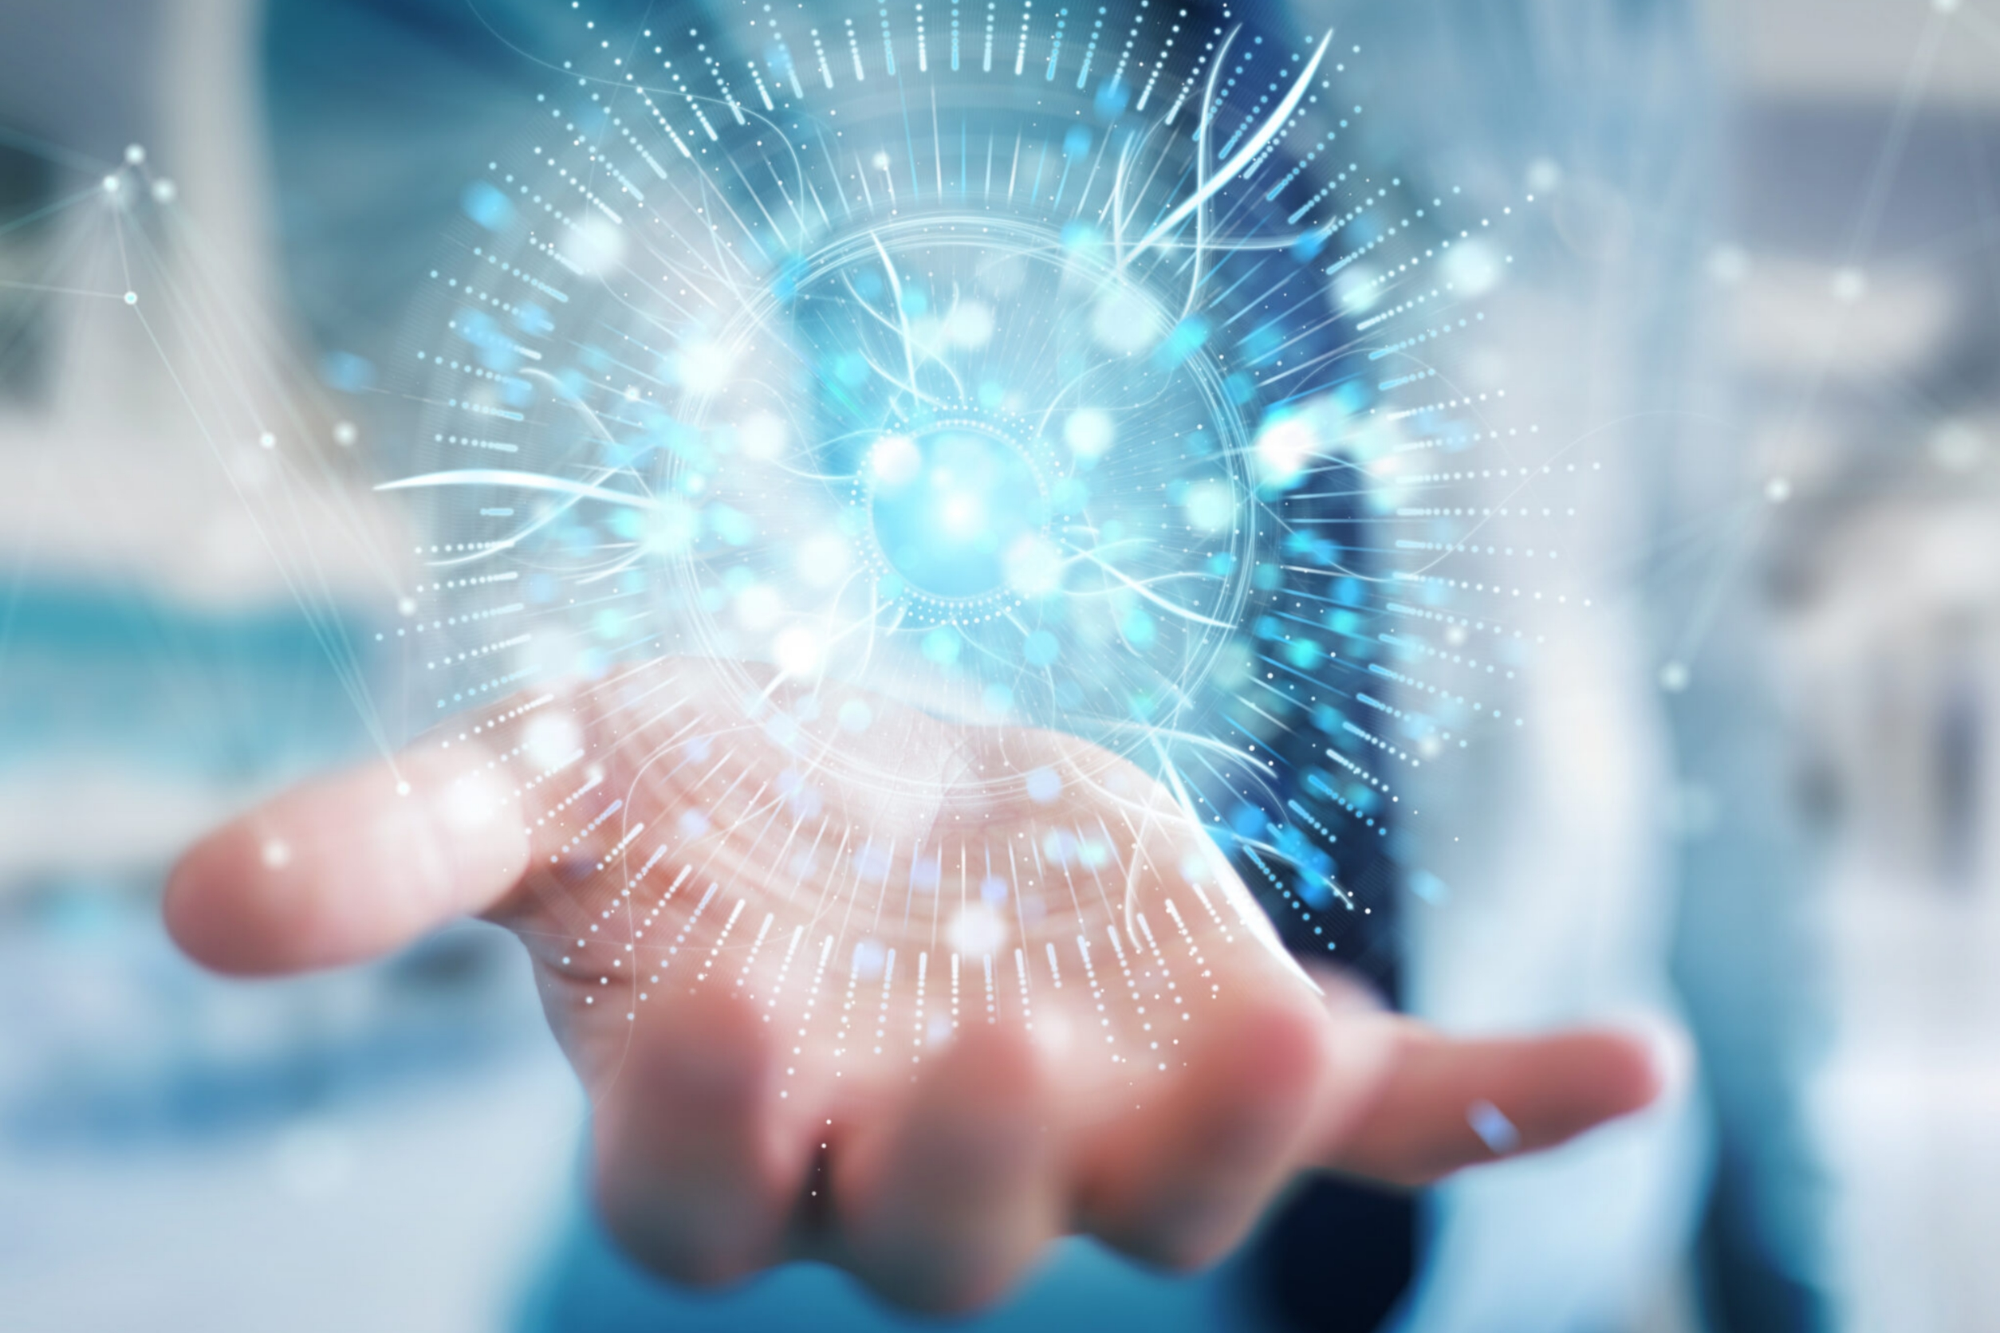 Medi2data secures Innovate UK Smart Grant to support eMR Health Passport